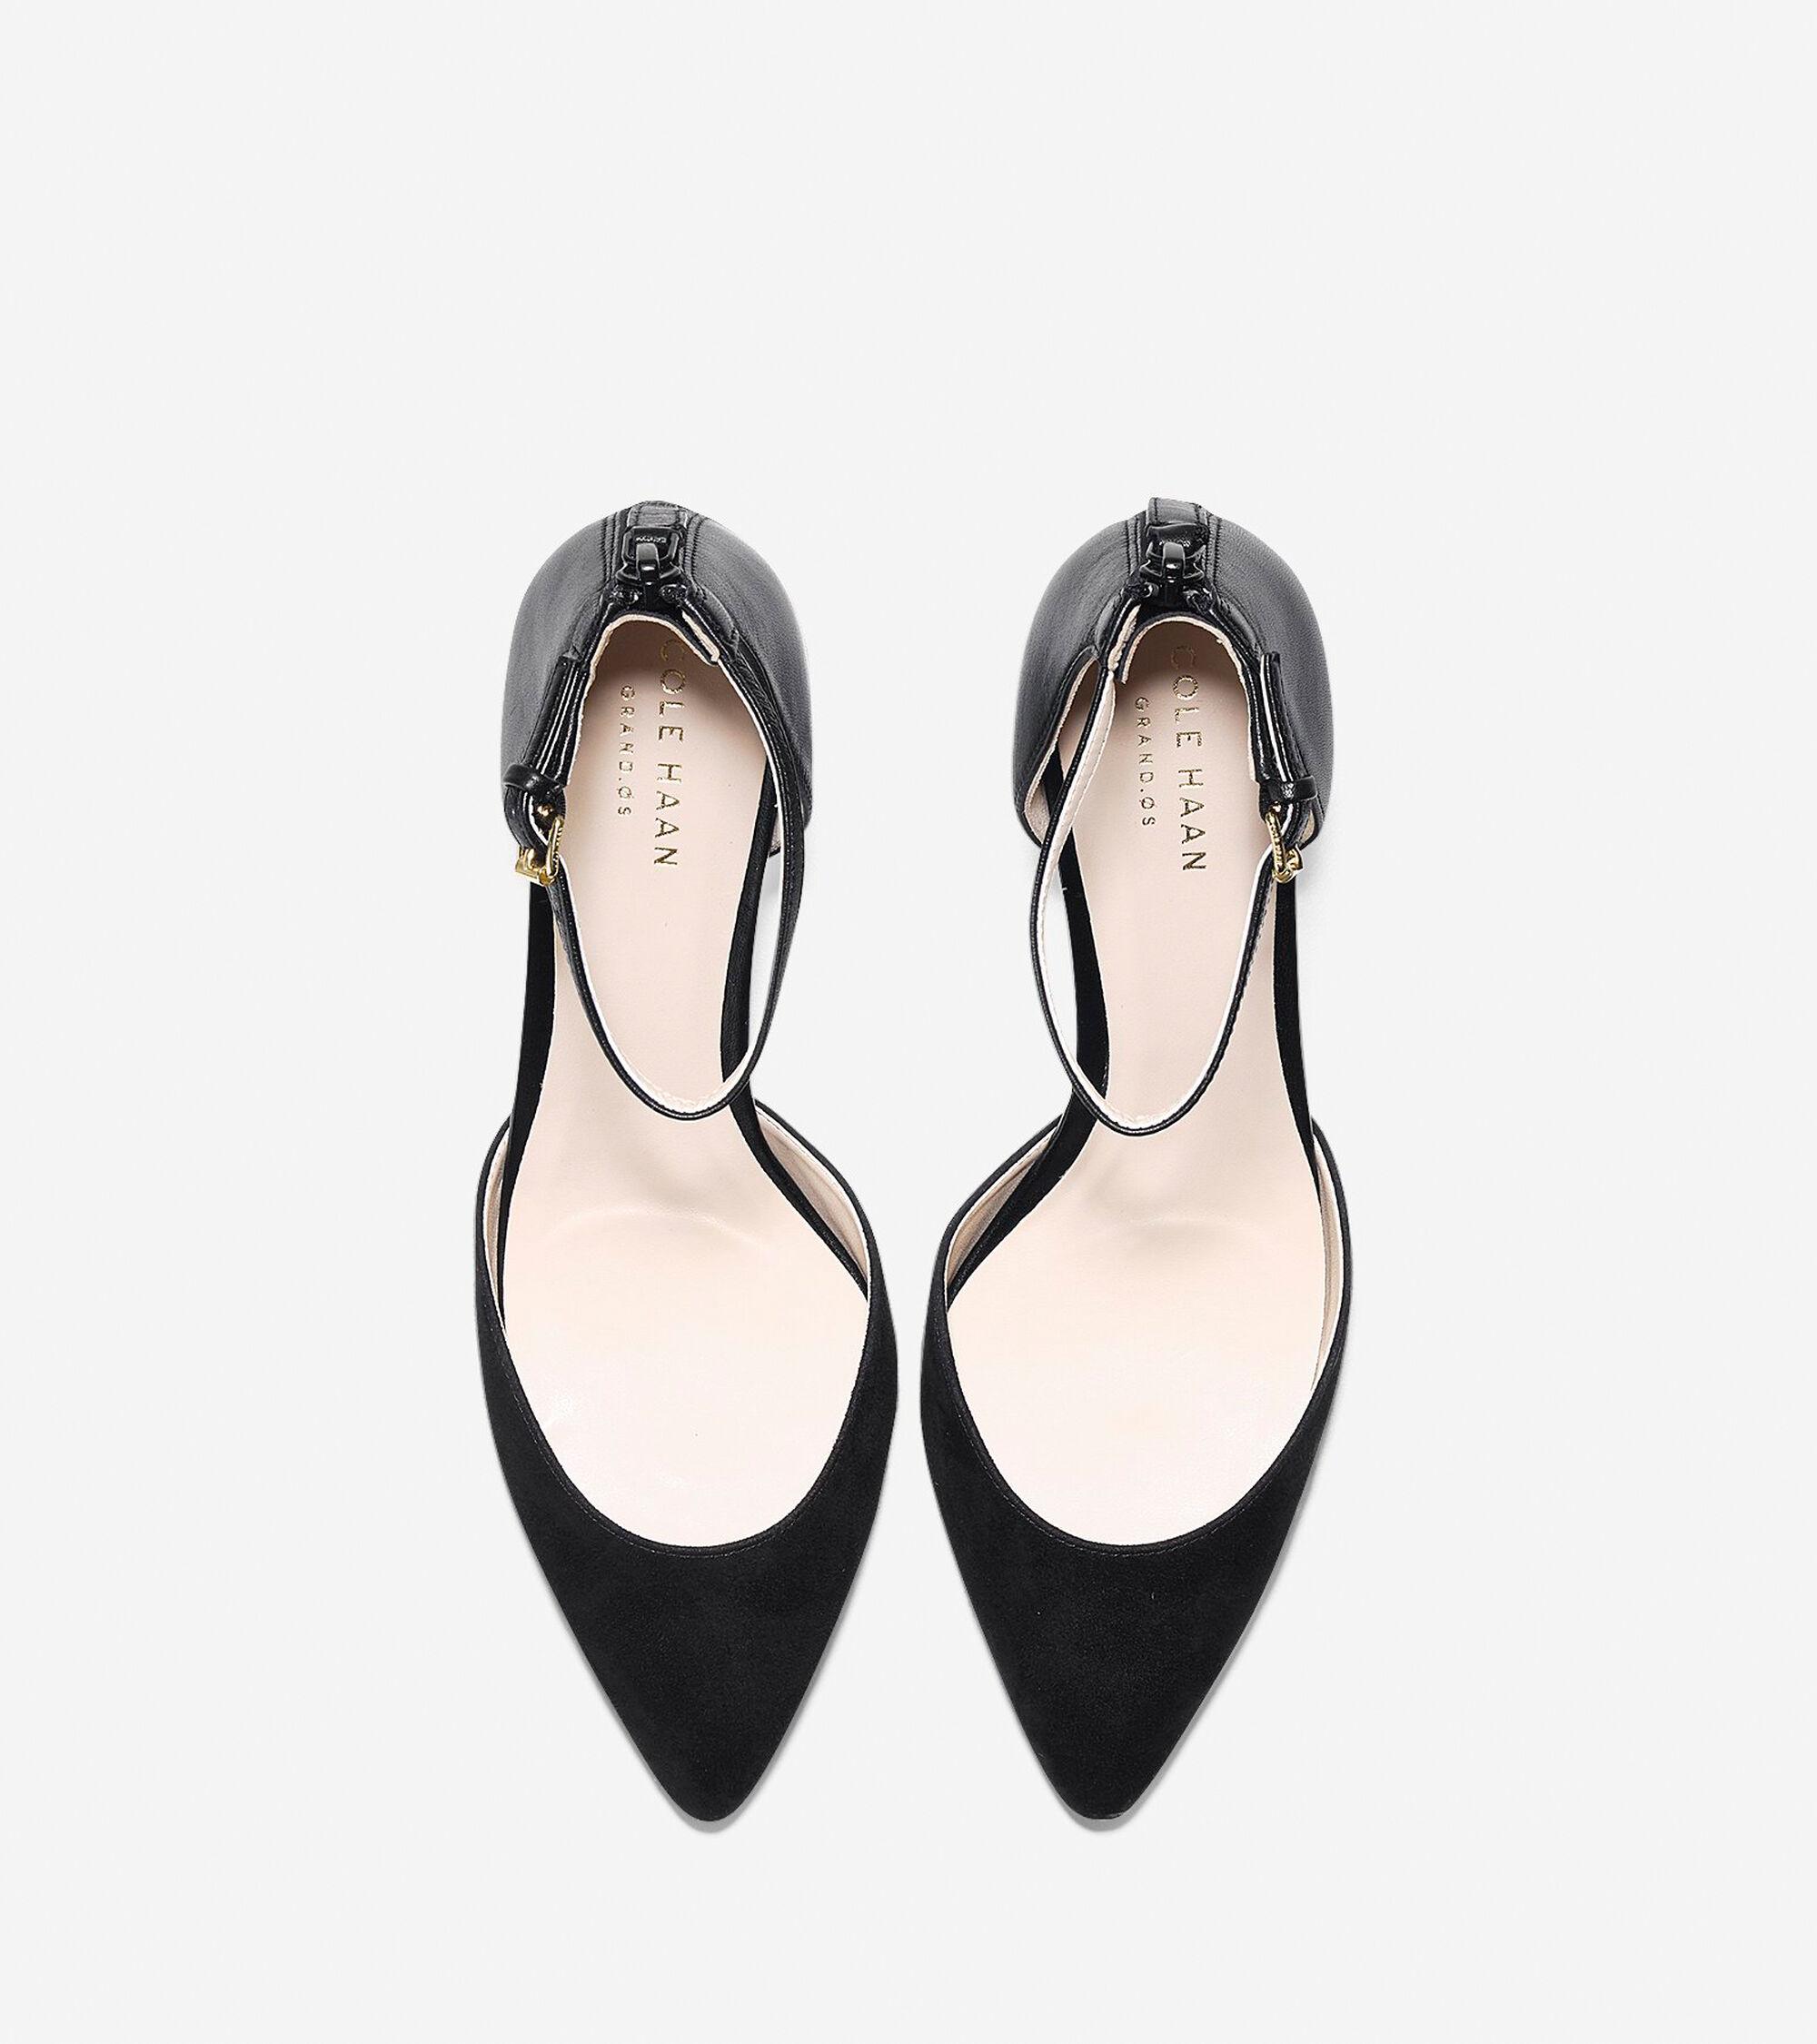 29a277830492 Women s Abigail Grand Ankle Strap Pumps 65mm in Black